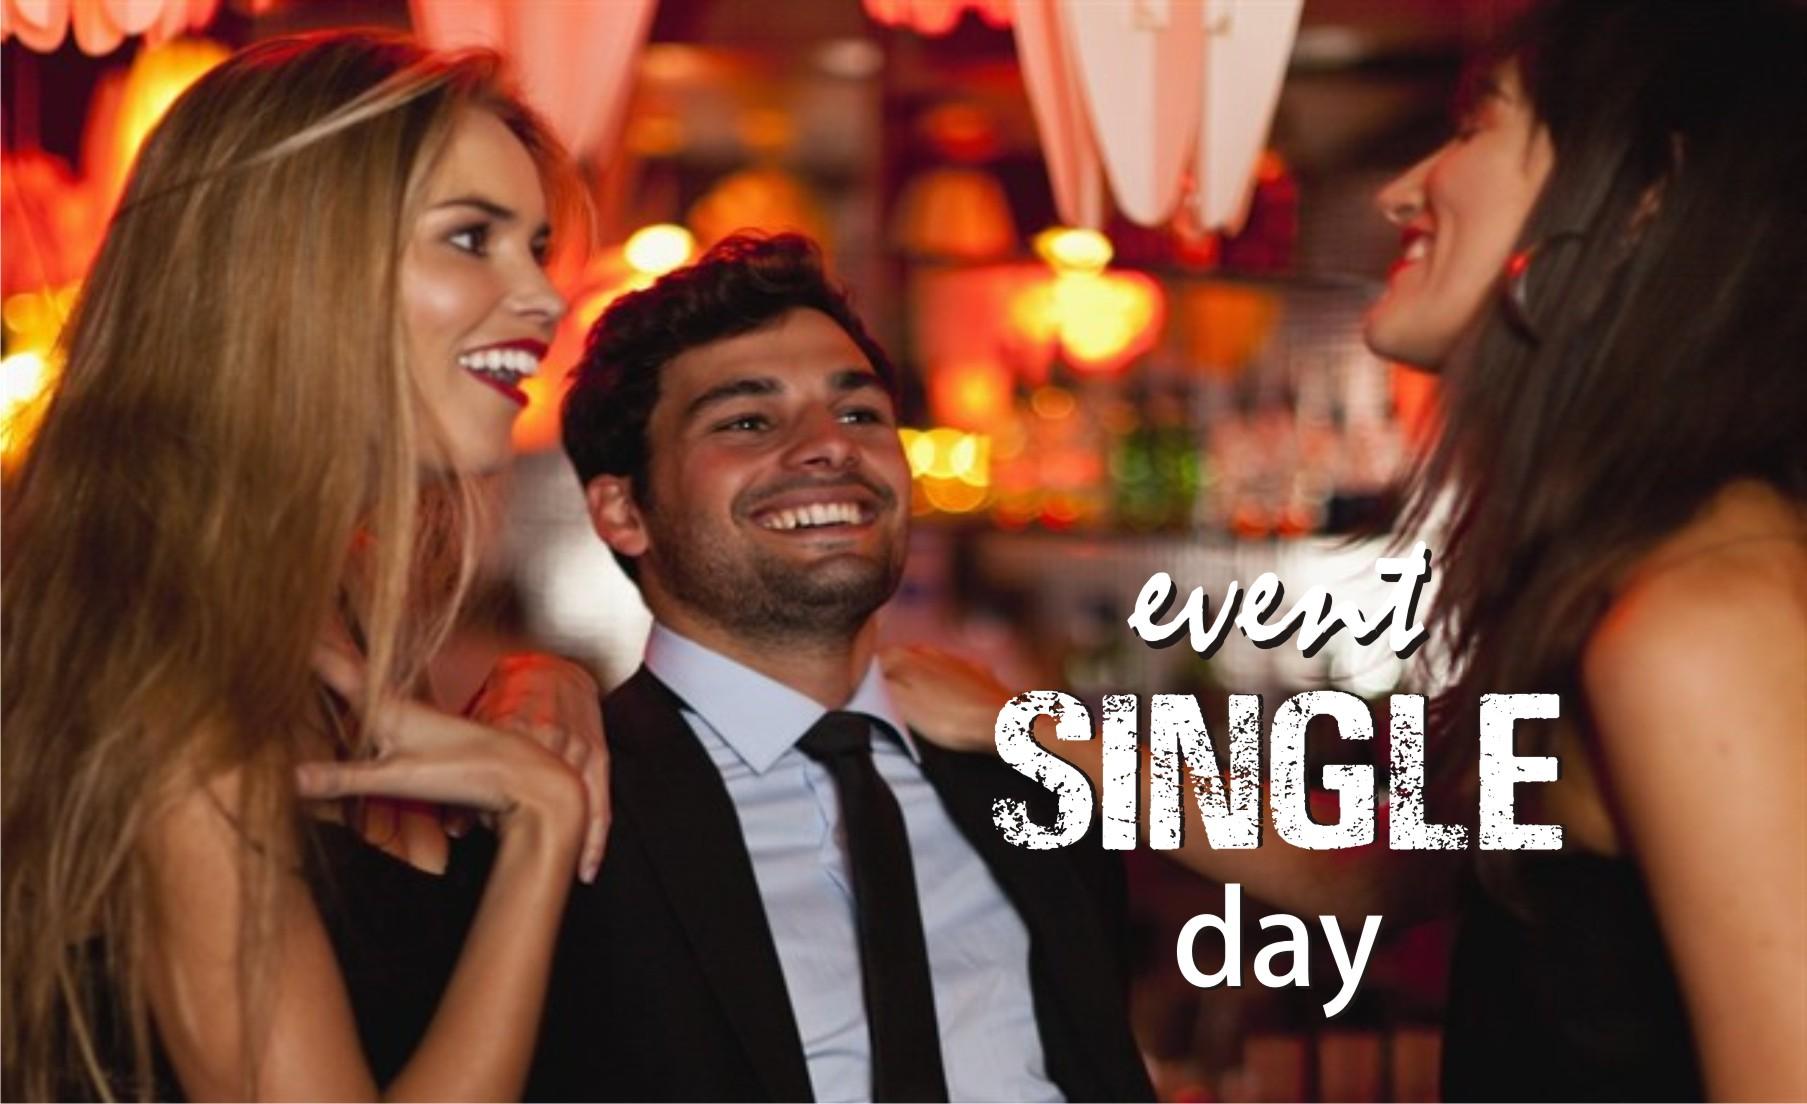 Promofestival - single day